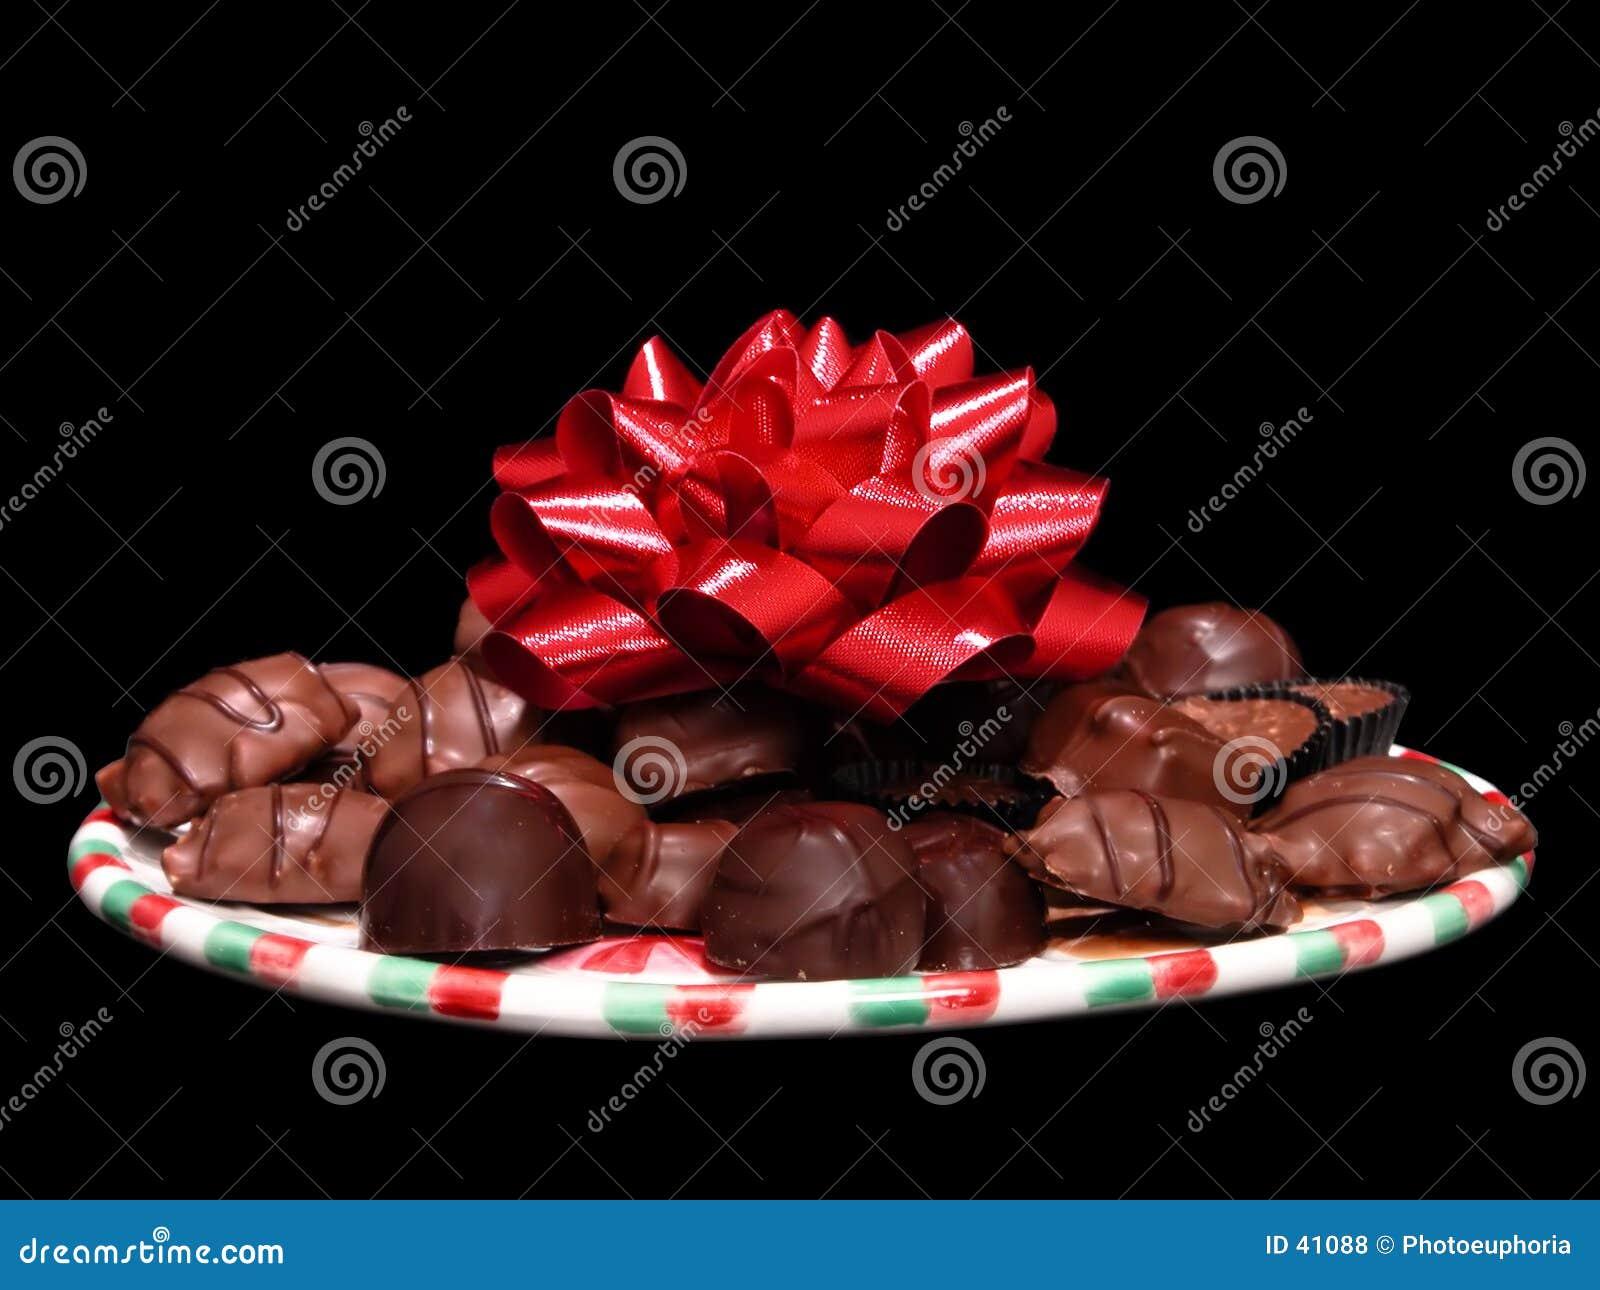 Chocolates Assorted